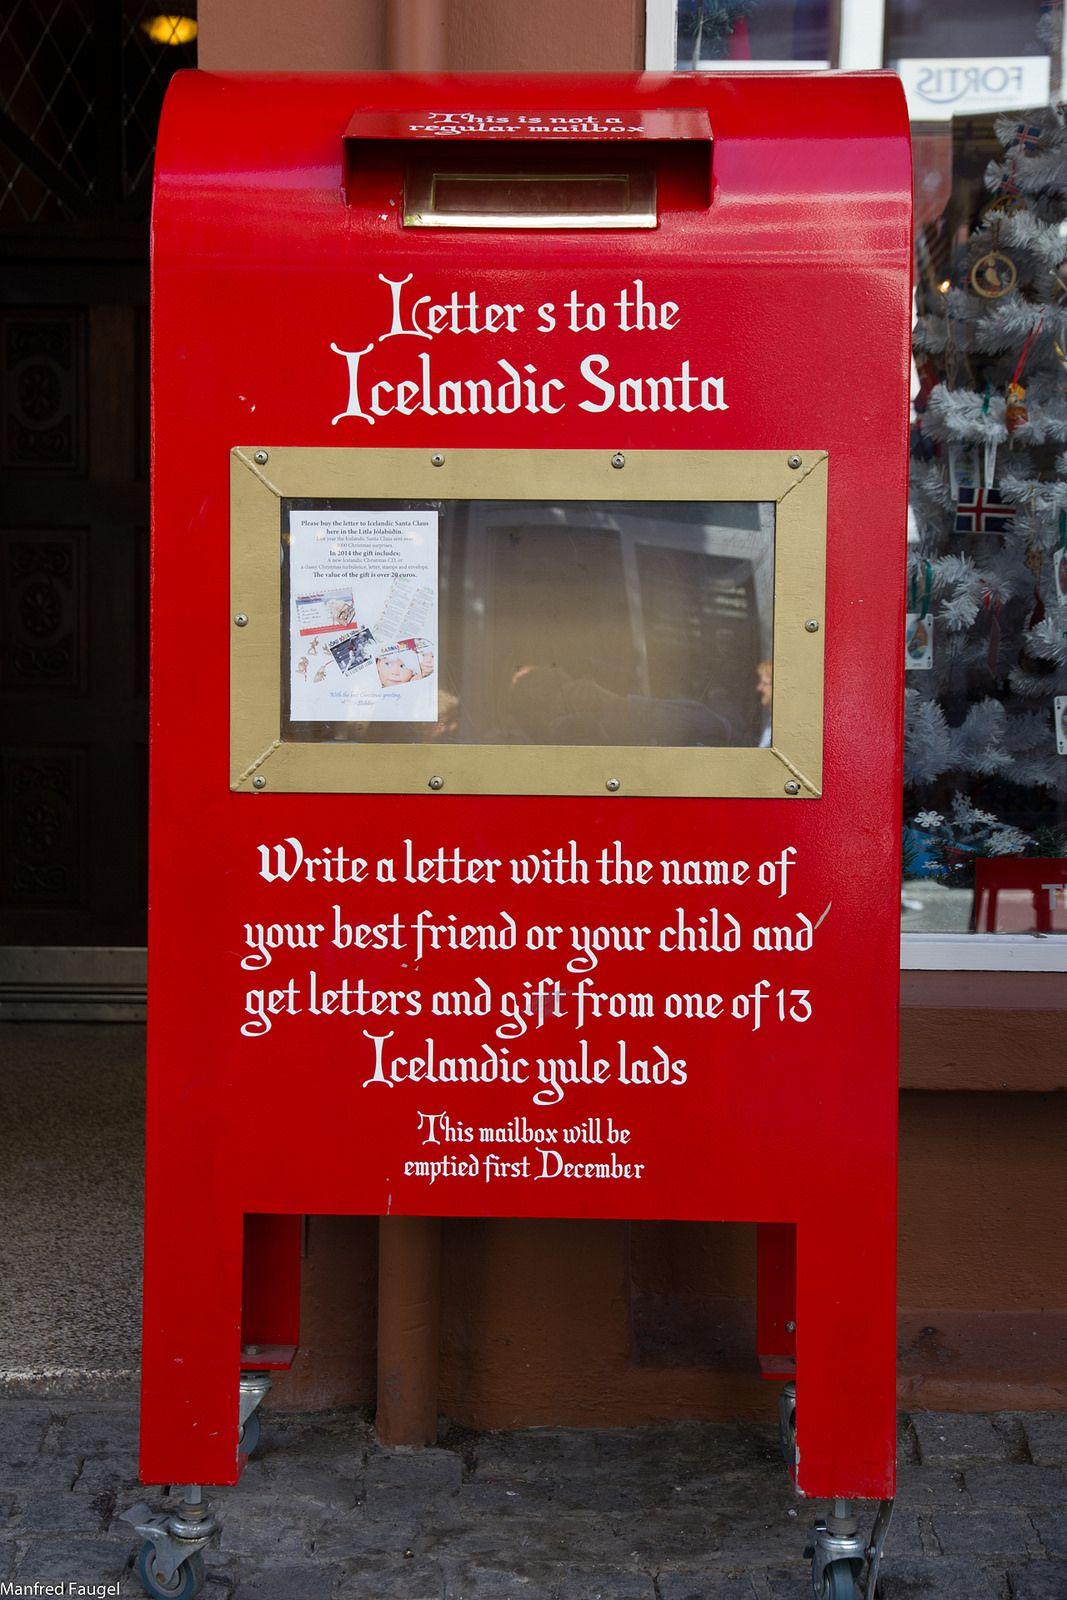 Icelandic Santa Mailbox Iceland Santa Mailbox Christmas Display